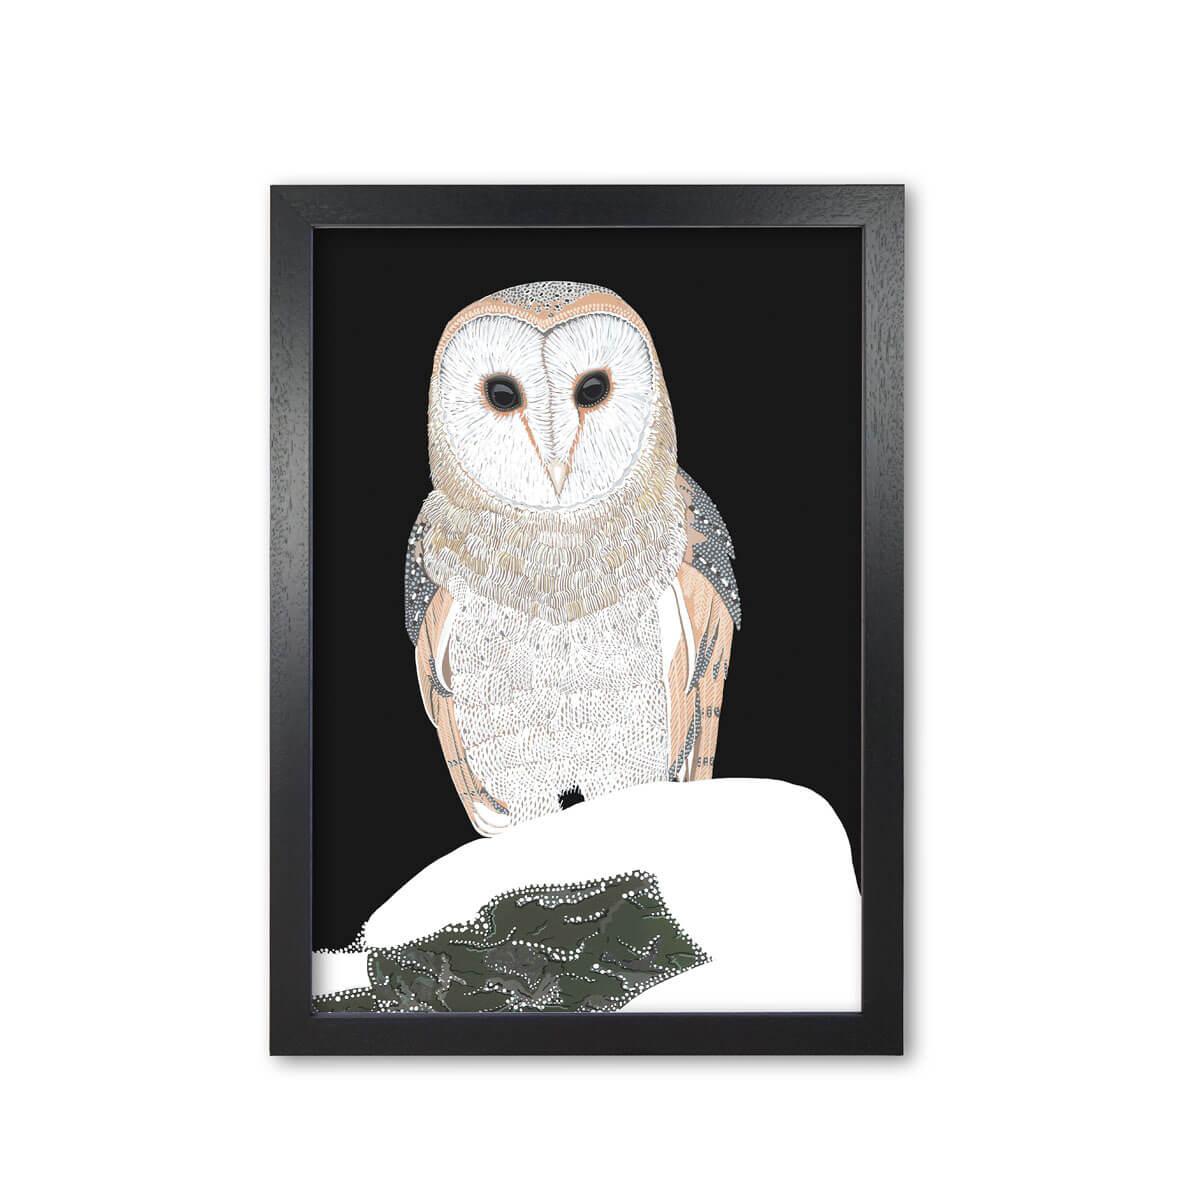 Barn Owl Print Mounted & Framed By Bird The Artist